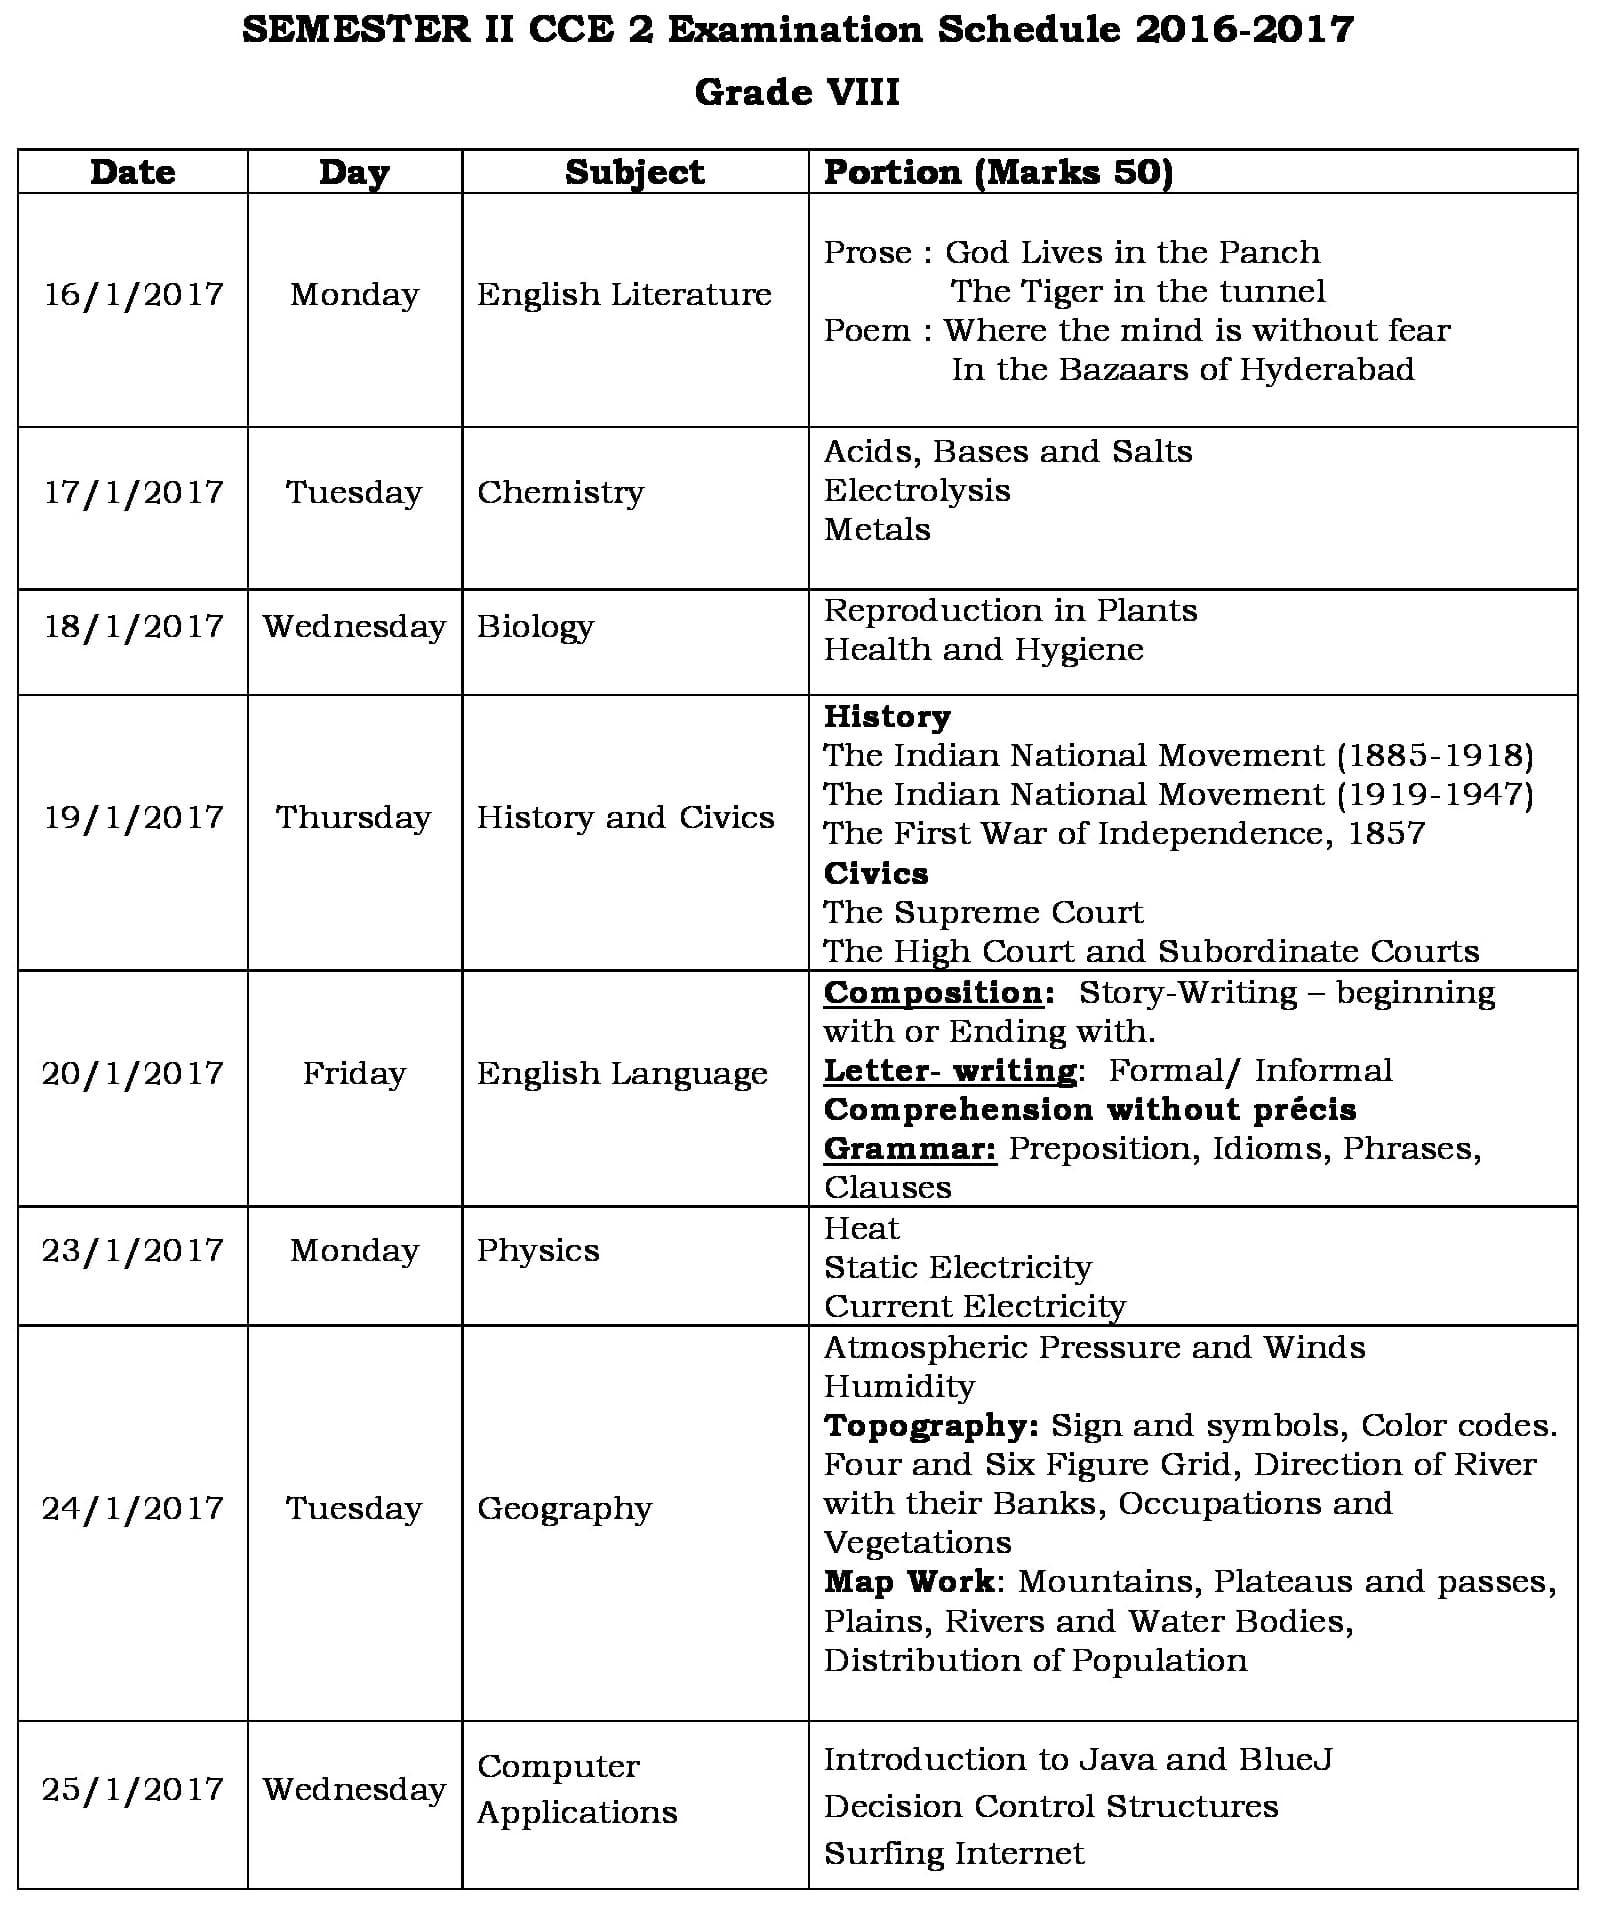 grade-viii-cce2-schedule-2016-17-0